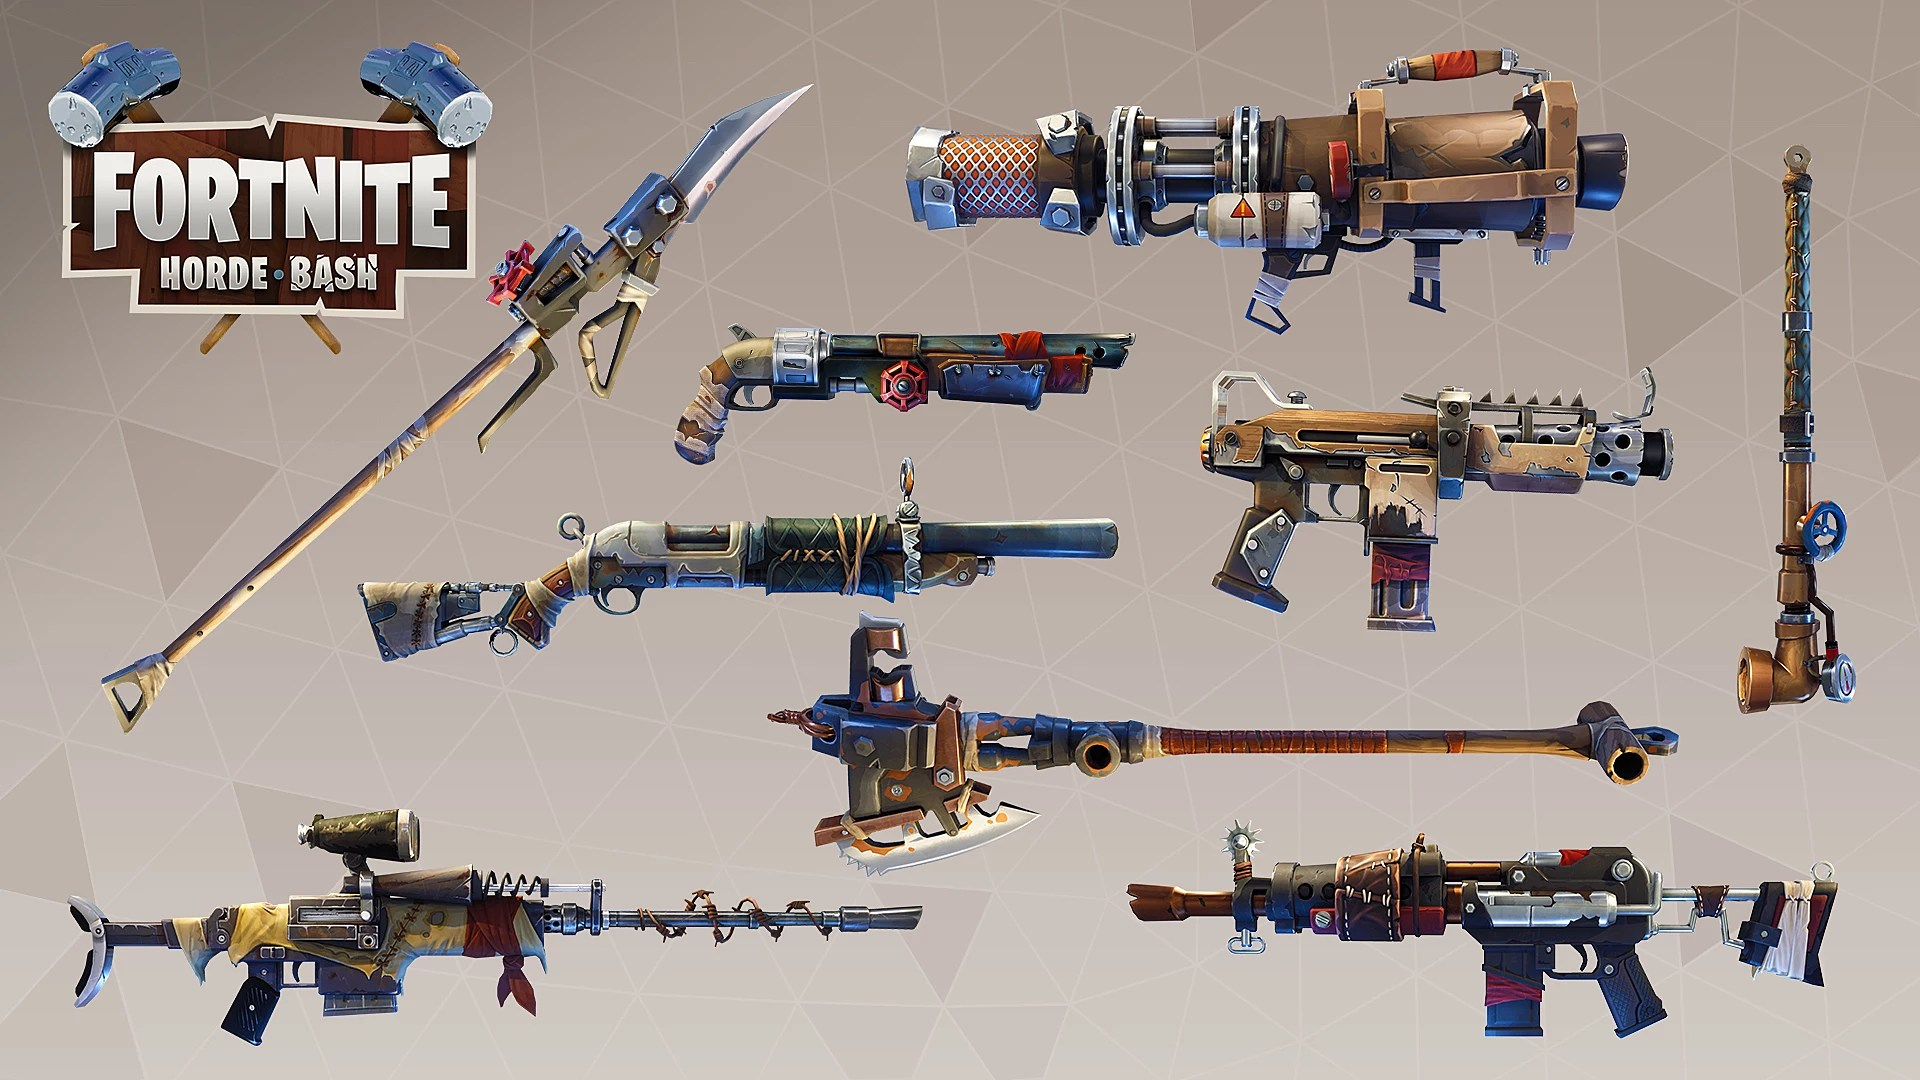 Top 10 Best Fornite Wallpapers Fortnite Horde Bash Mode Survival Guide Fortnite